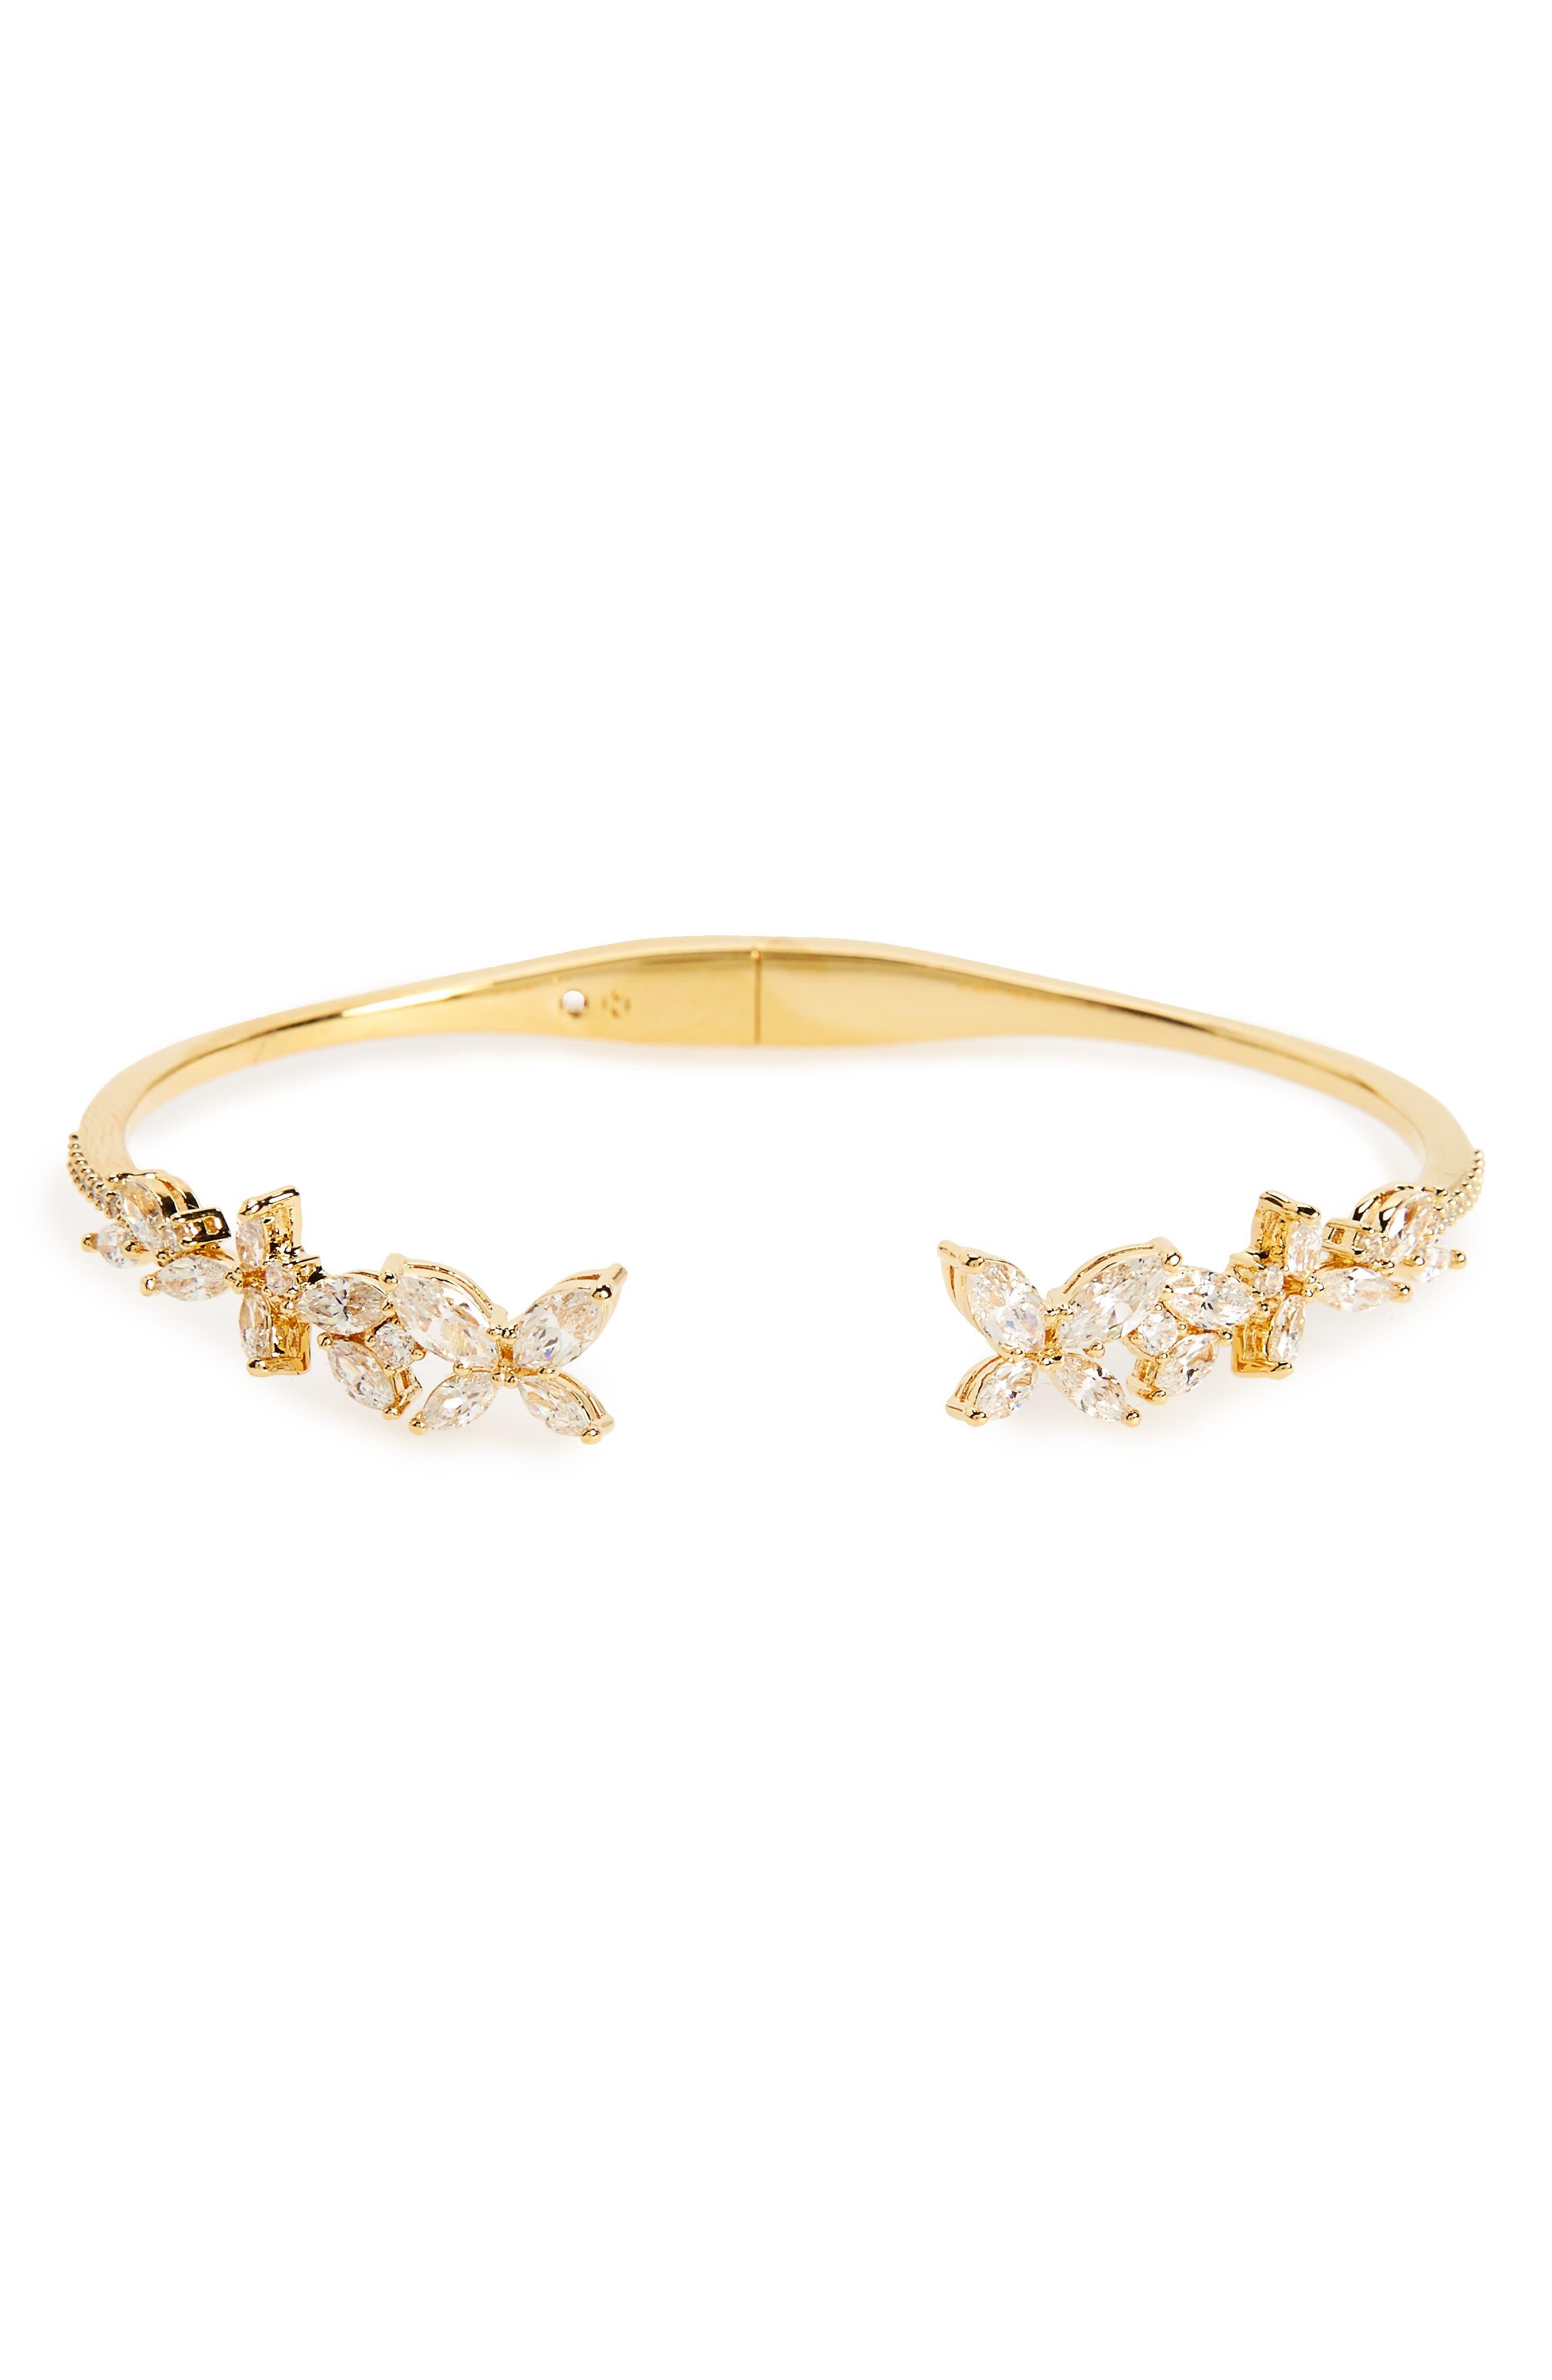 Papillon Hinge Bangle,                         Main,                         color, Gold